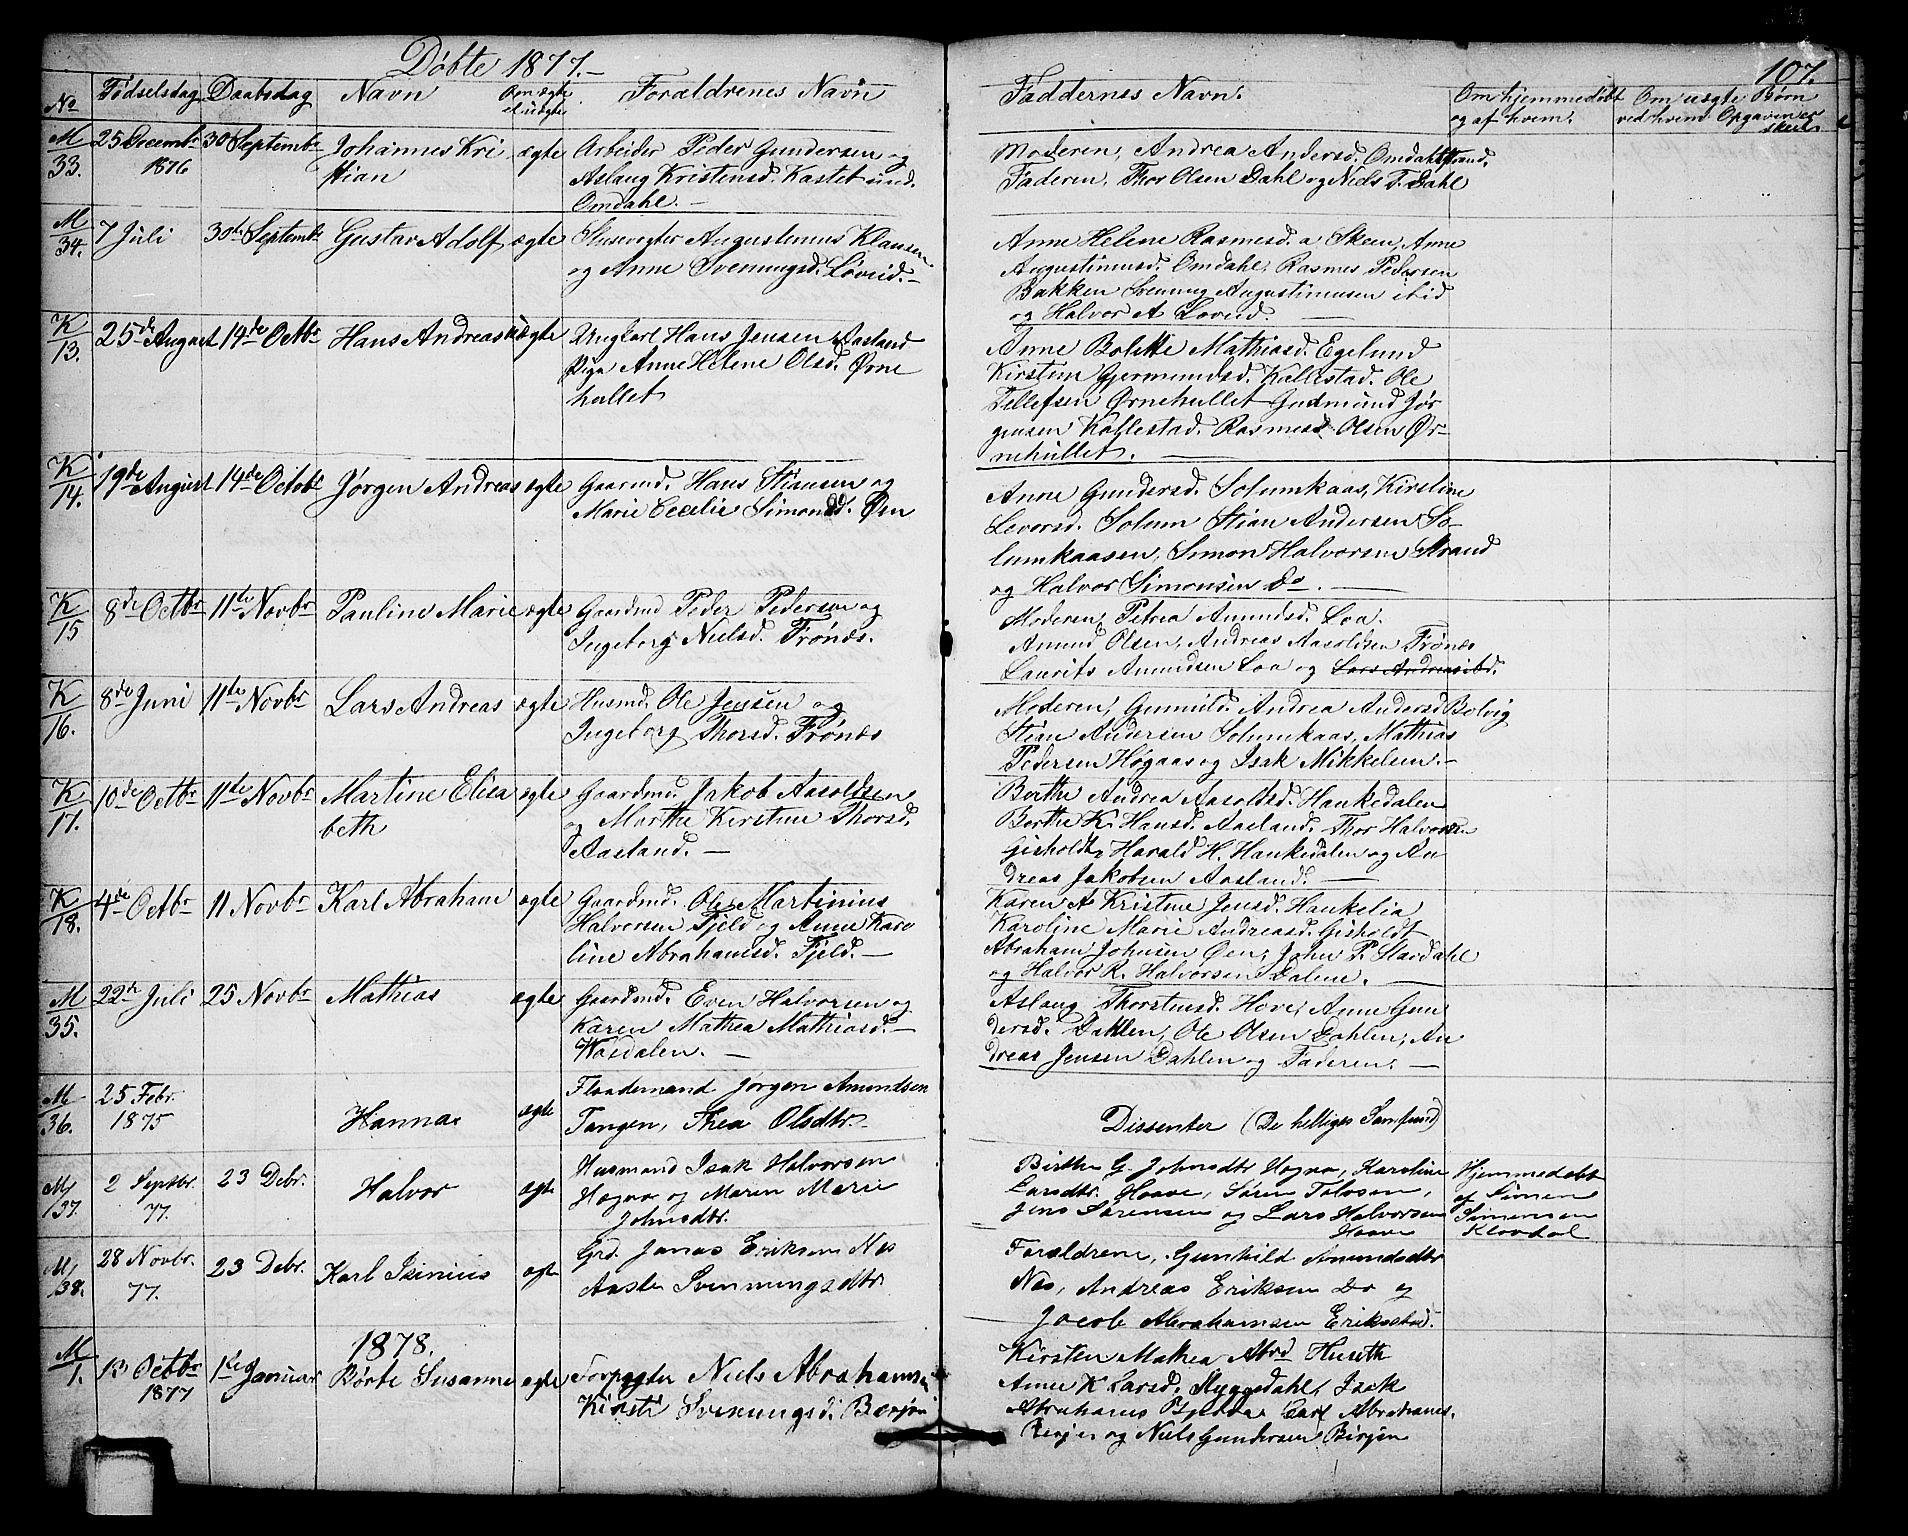 SAKO, Solum kirkebøker, G/Gb/L0002: Klokkerbok nr. II 2, 1859-1879, s. 107